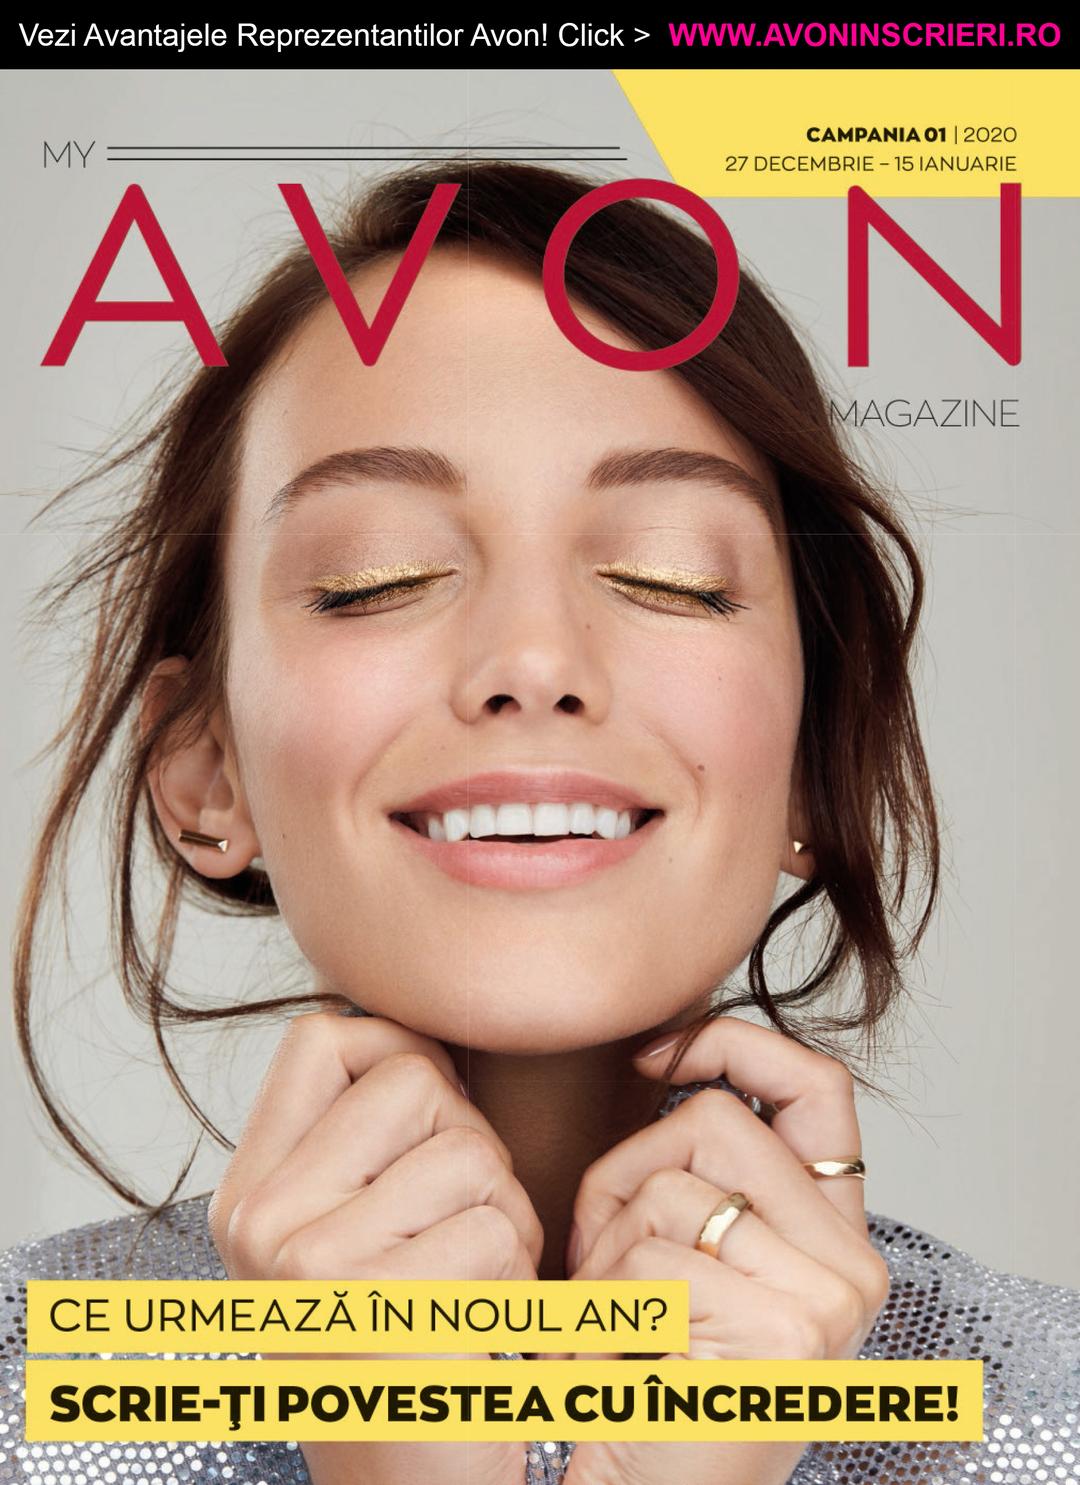 Page 1 of Revista My Avon Magazine C1 2020 - www.avoninscrieri.ro